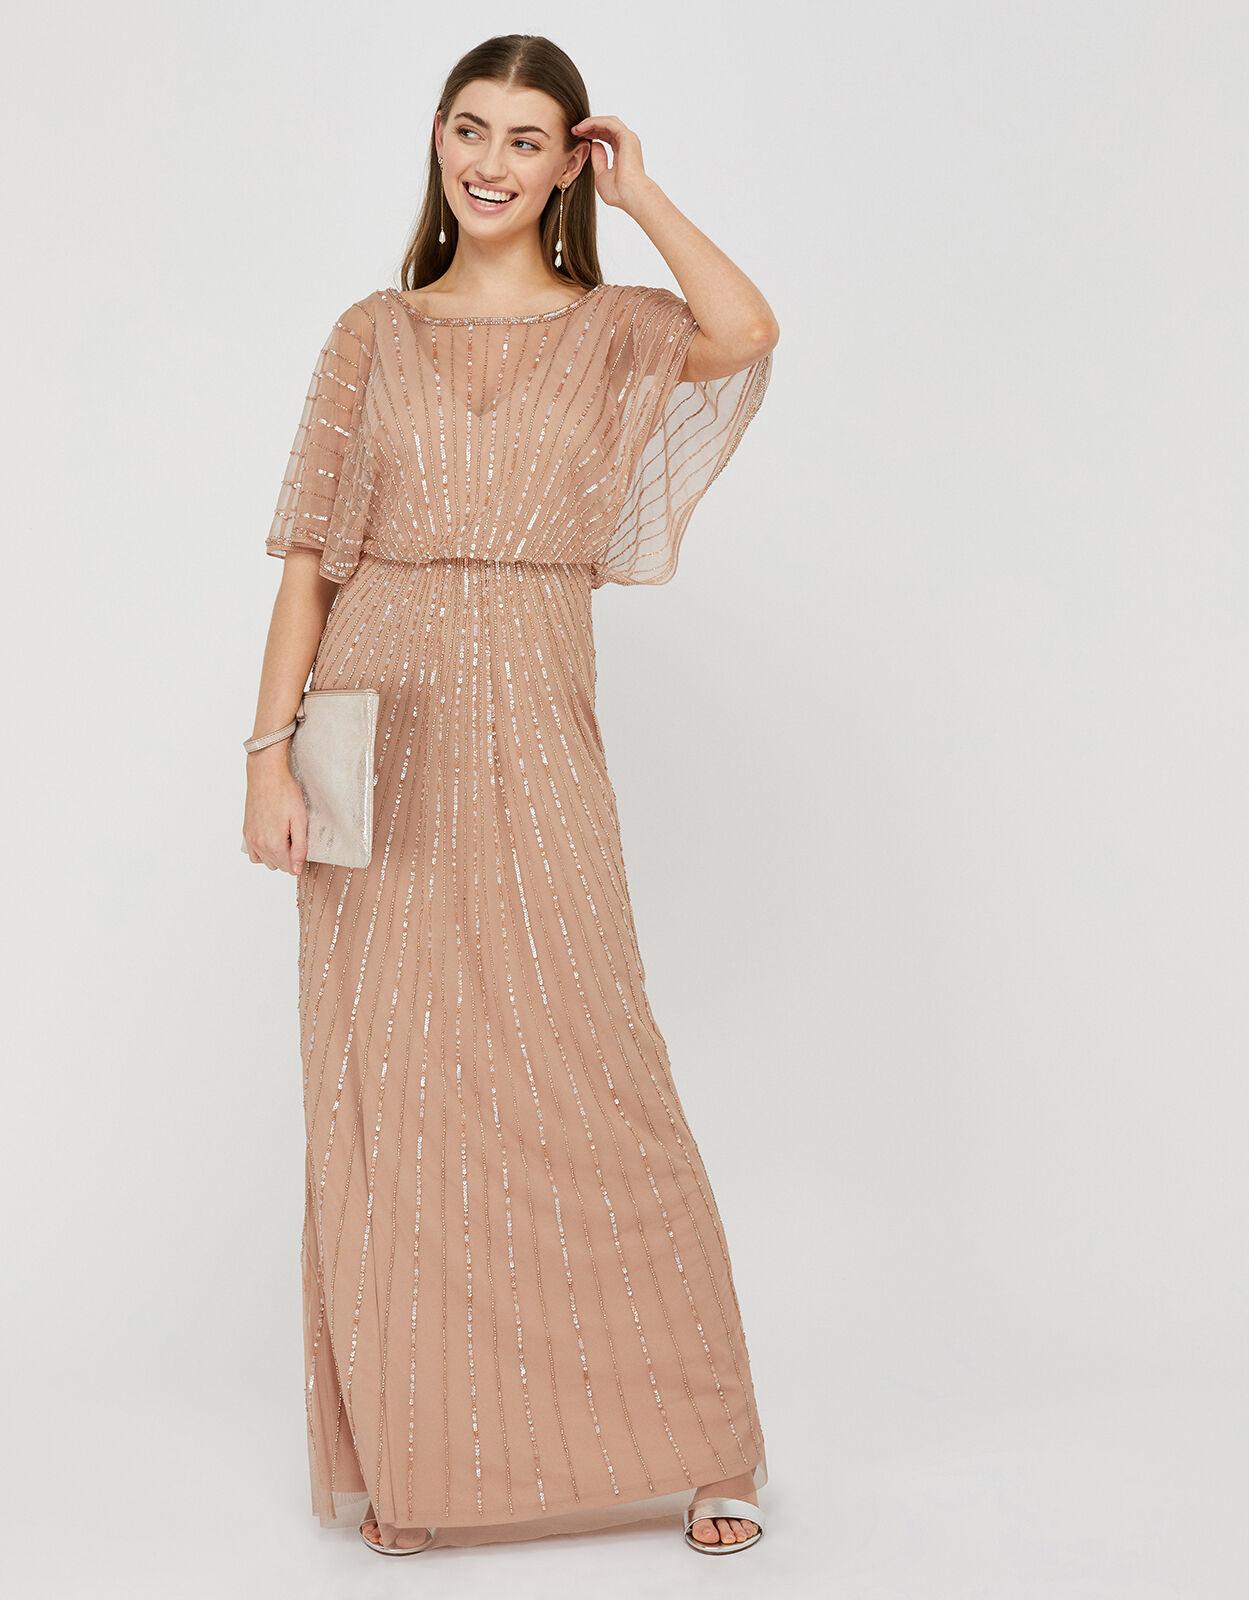 Beaded Dress,Maxi Dresses with Beading,Angelina Dresses,Beaded Dresses for Women,Evening Dresses Pink,Monsoon Evening Dresses,monsoon dresses,monsoon dresses,beaded dress,beaded dress,